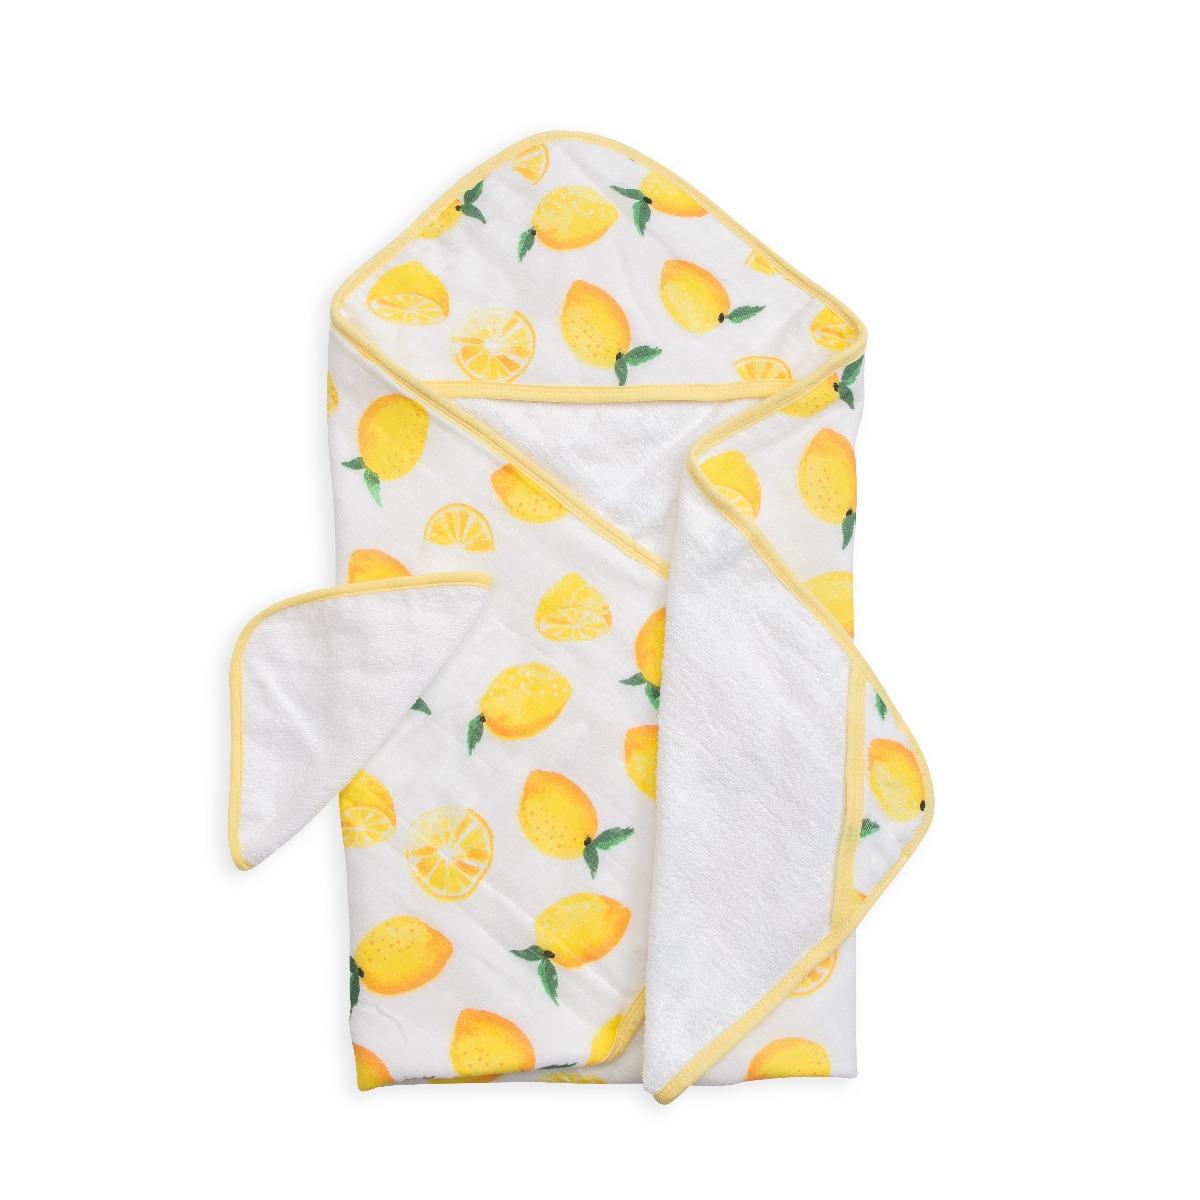 Little Unicorn Hooded Towel & Washcloth Set Lemon